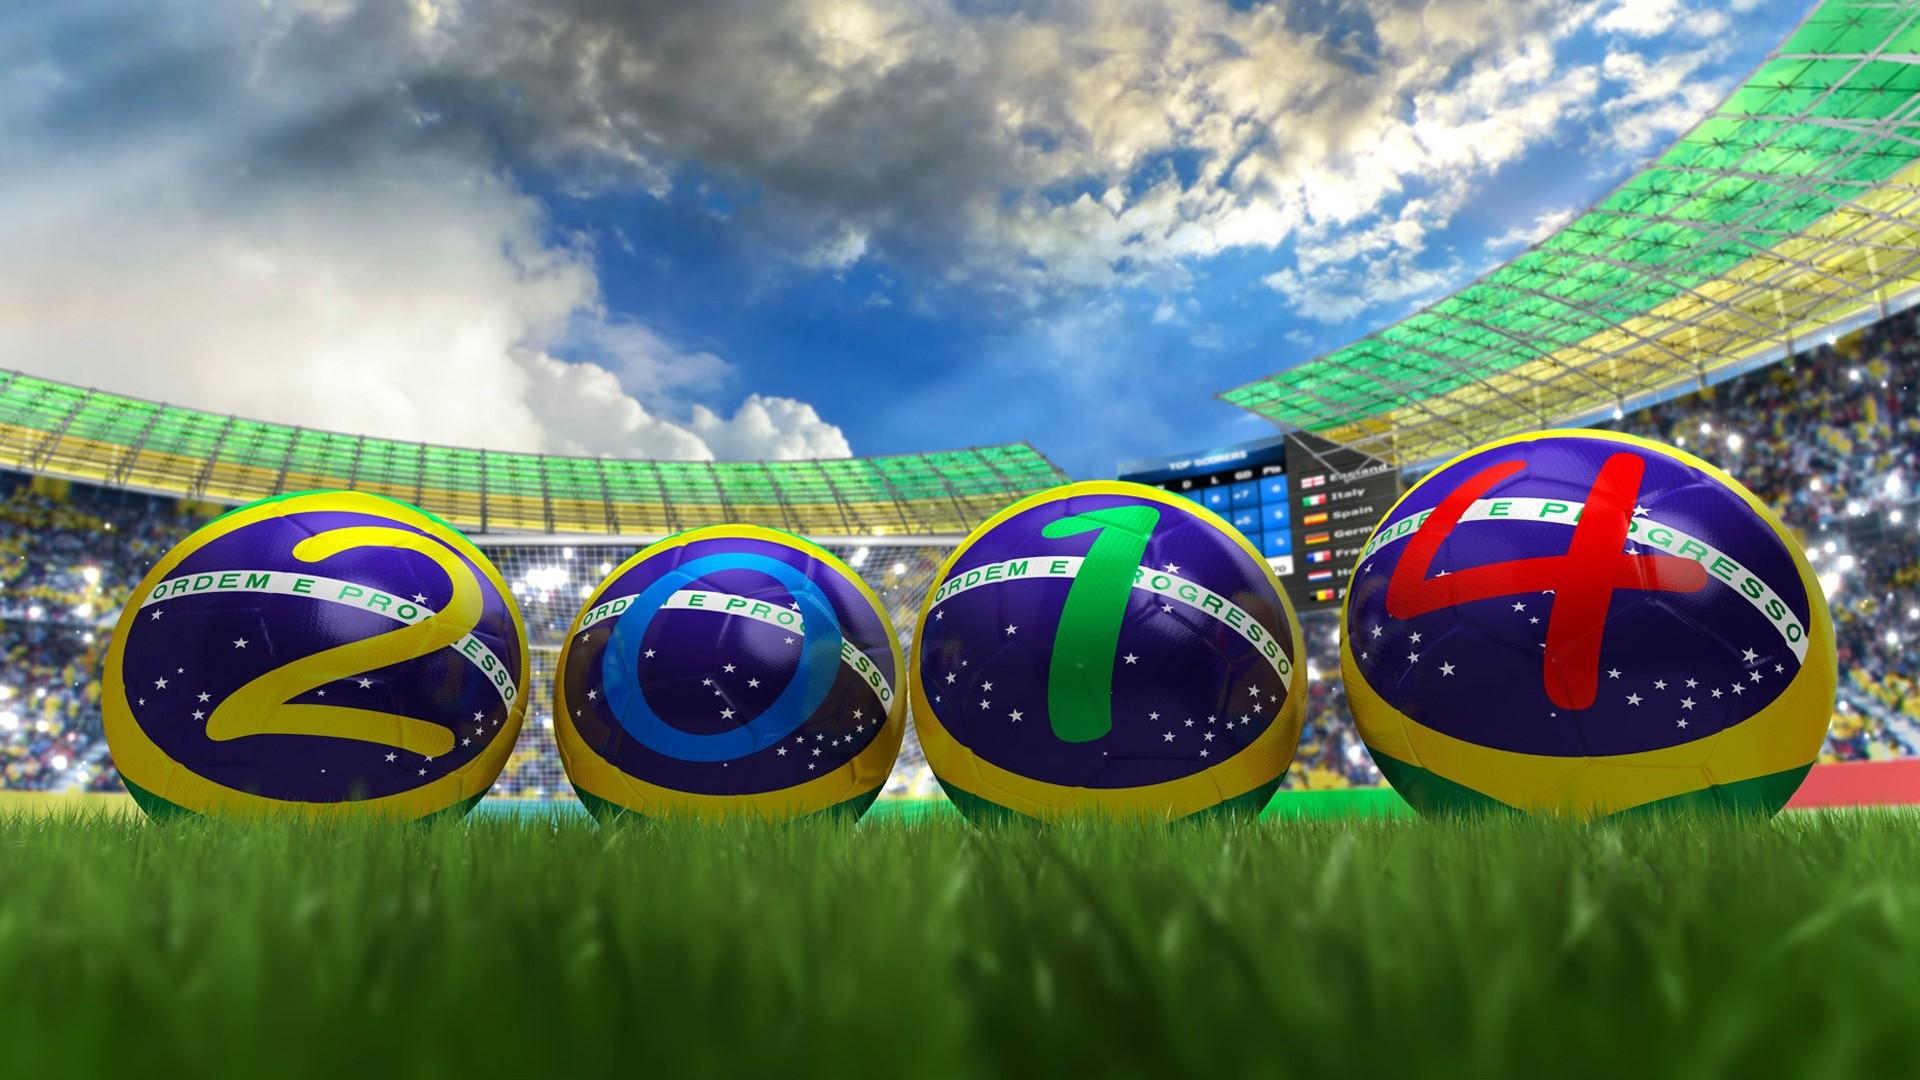 Fifa-Nice-hd-1080-wallpaper-wpc9004923